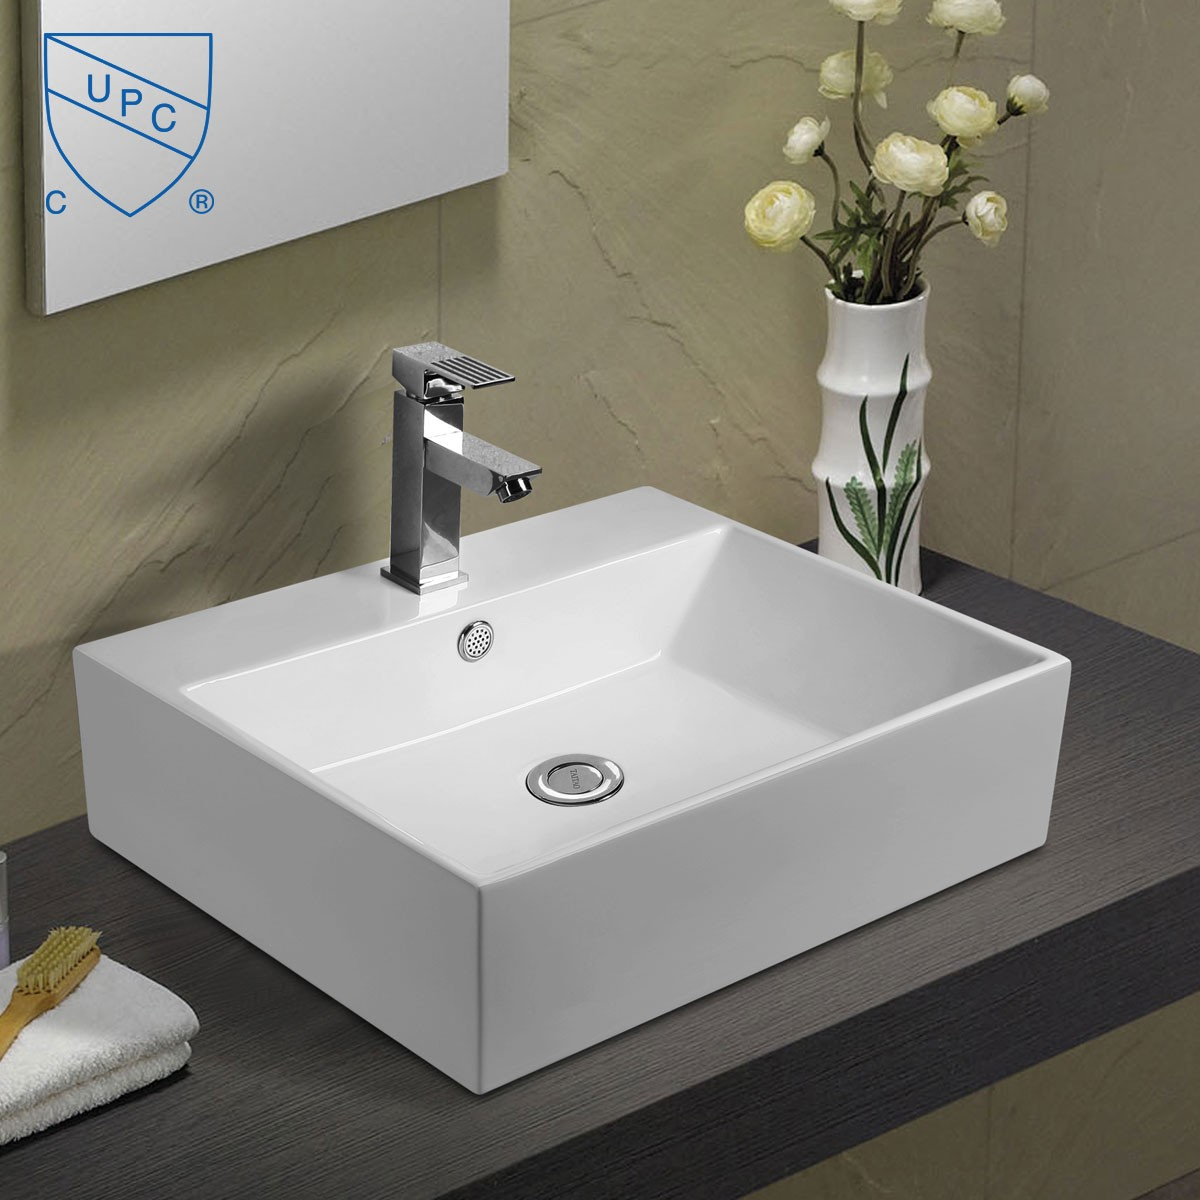 salle de bain u cuisine de dessus de comptoir en comptoir en ceramique salle de bain with panneau renovation salle de bain - Dessus De Comptoir Salle De Bain